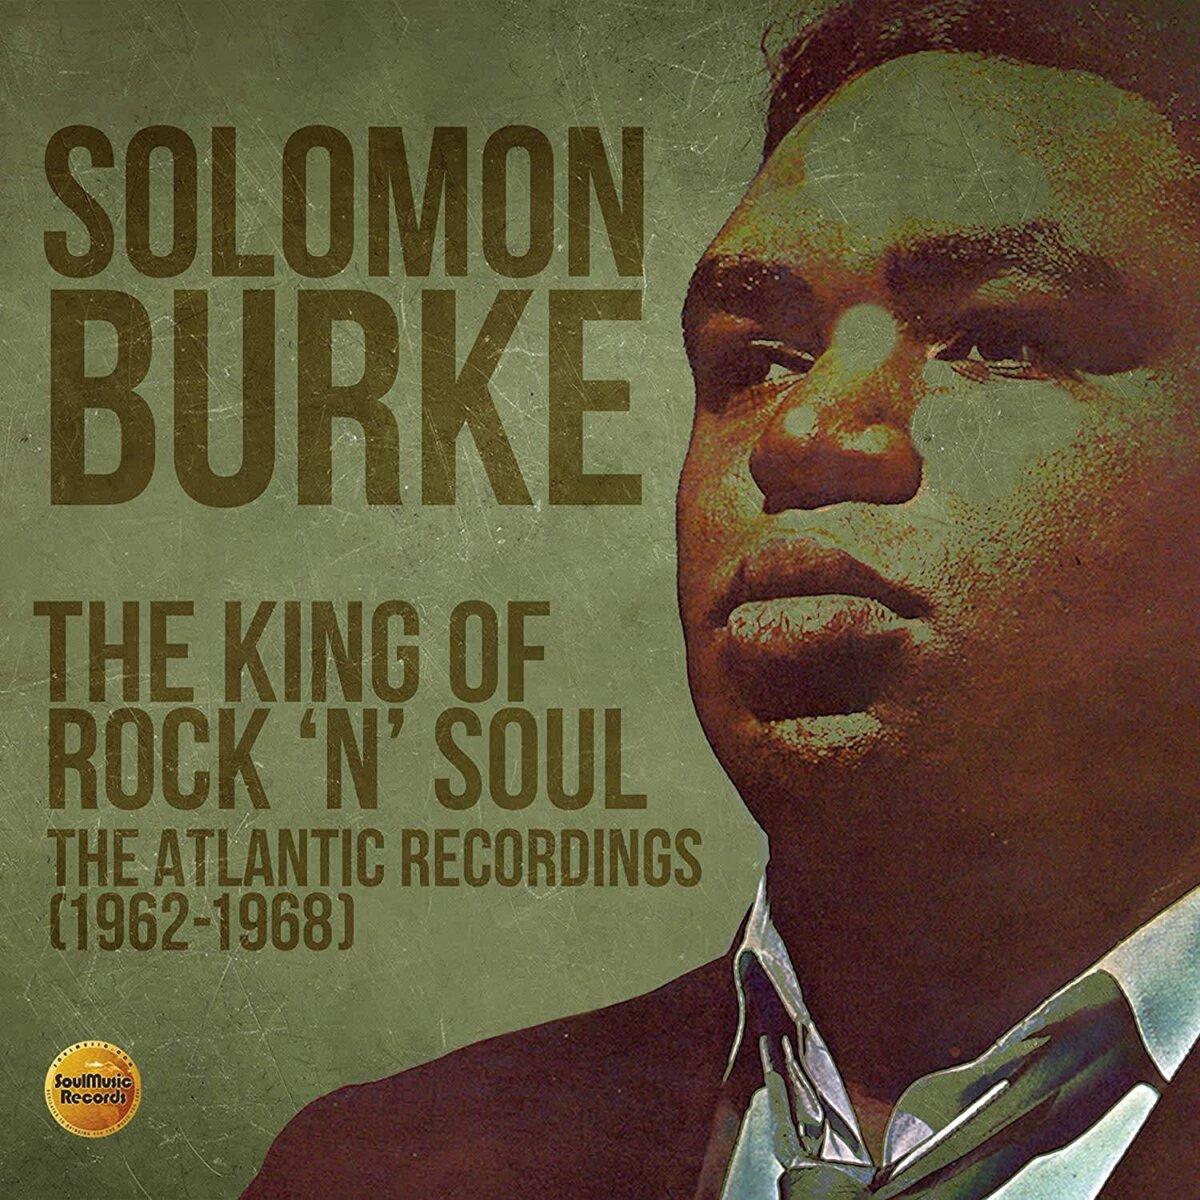 Solomon Burke - The King Of Rock N Soul: The Atlantic Recordings 1962-1968